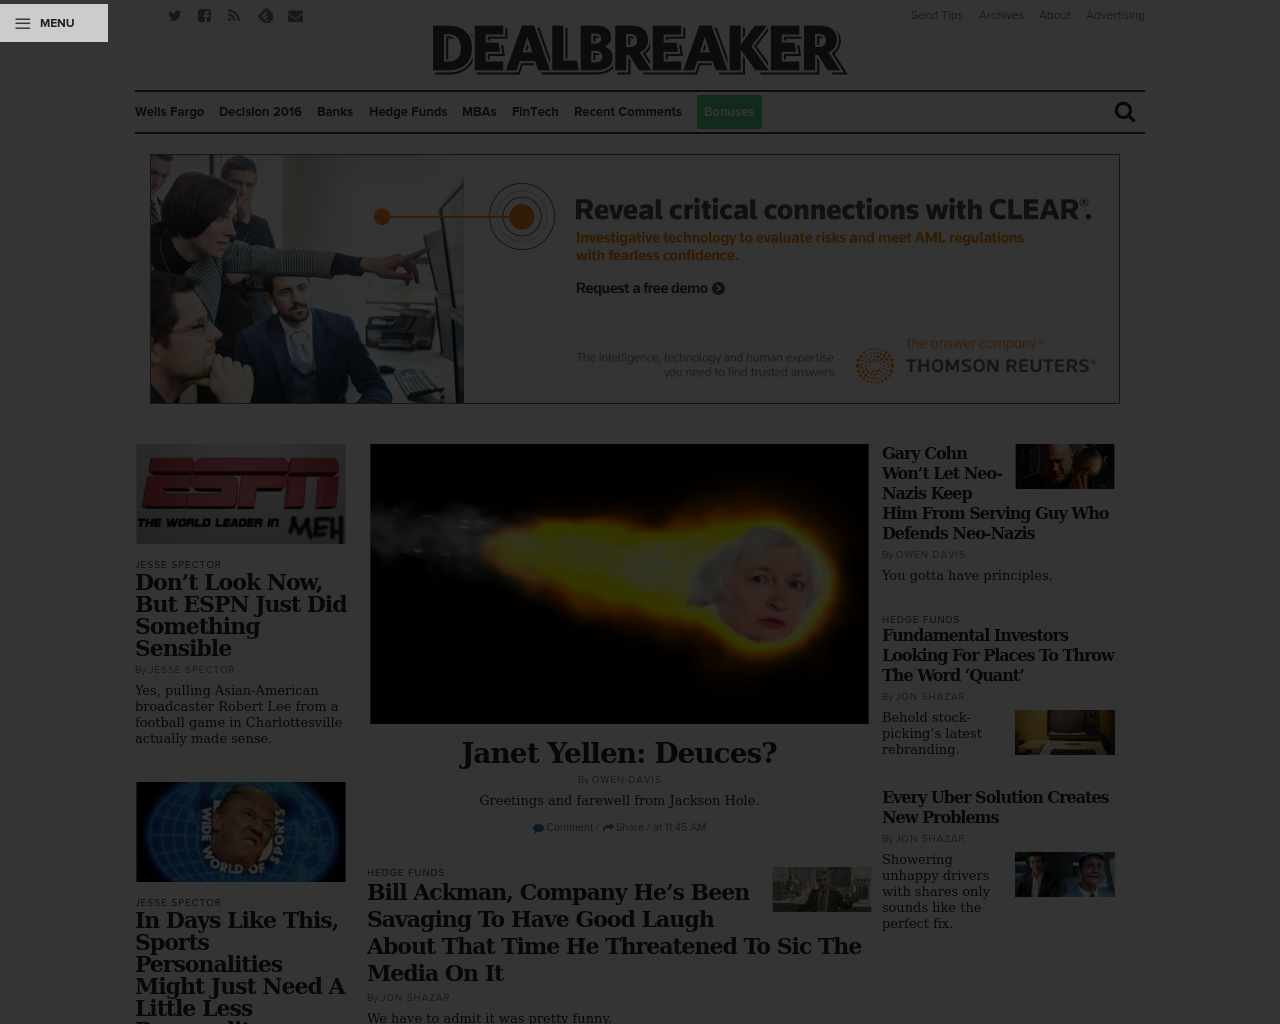 Dealbreaker-Advertising-Reviews-Pricing